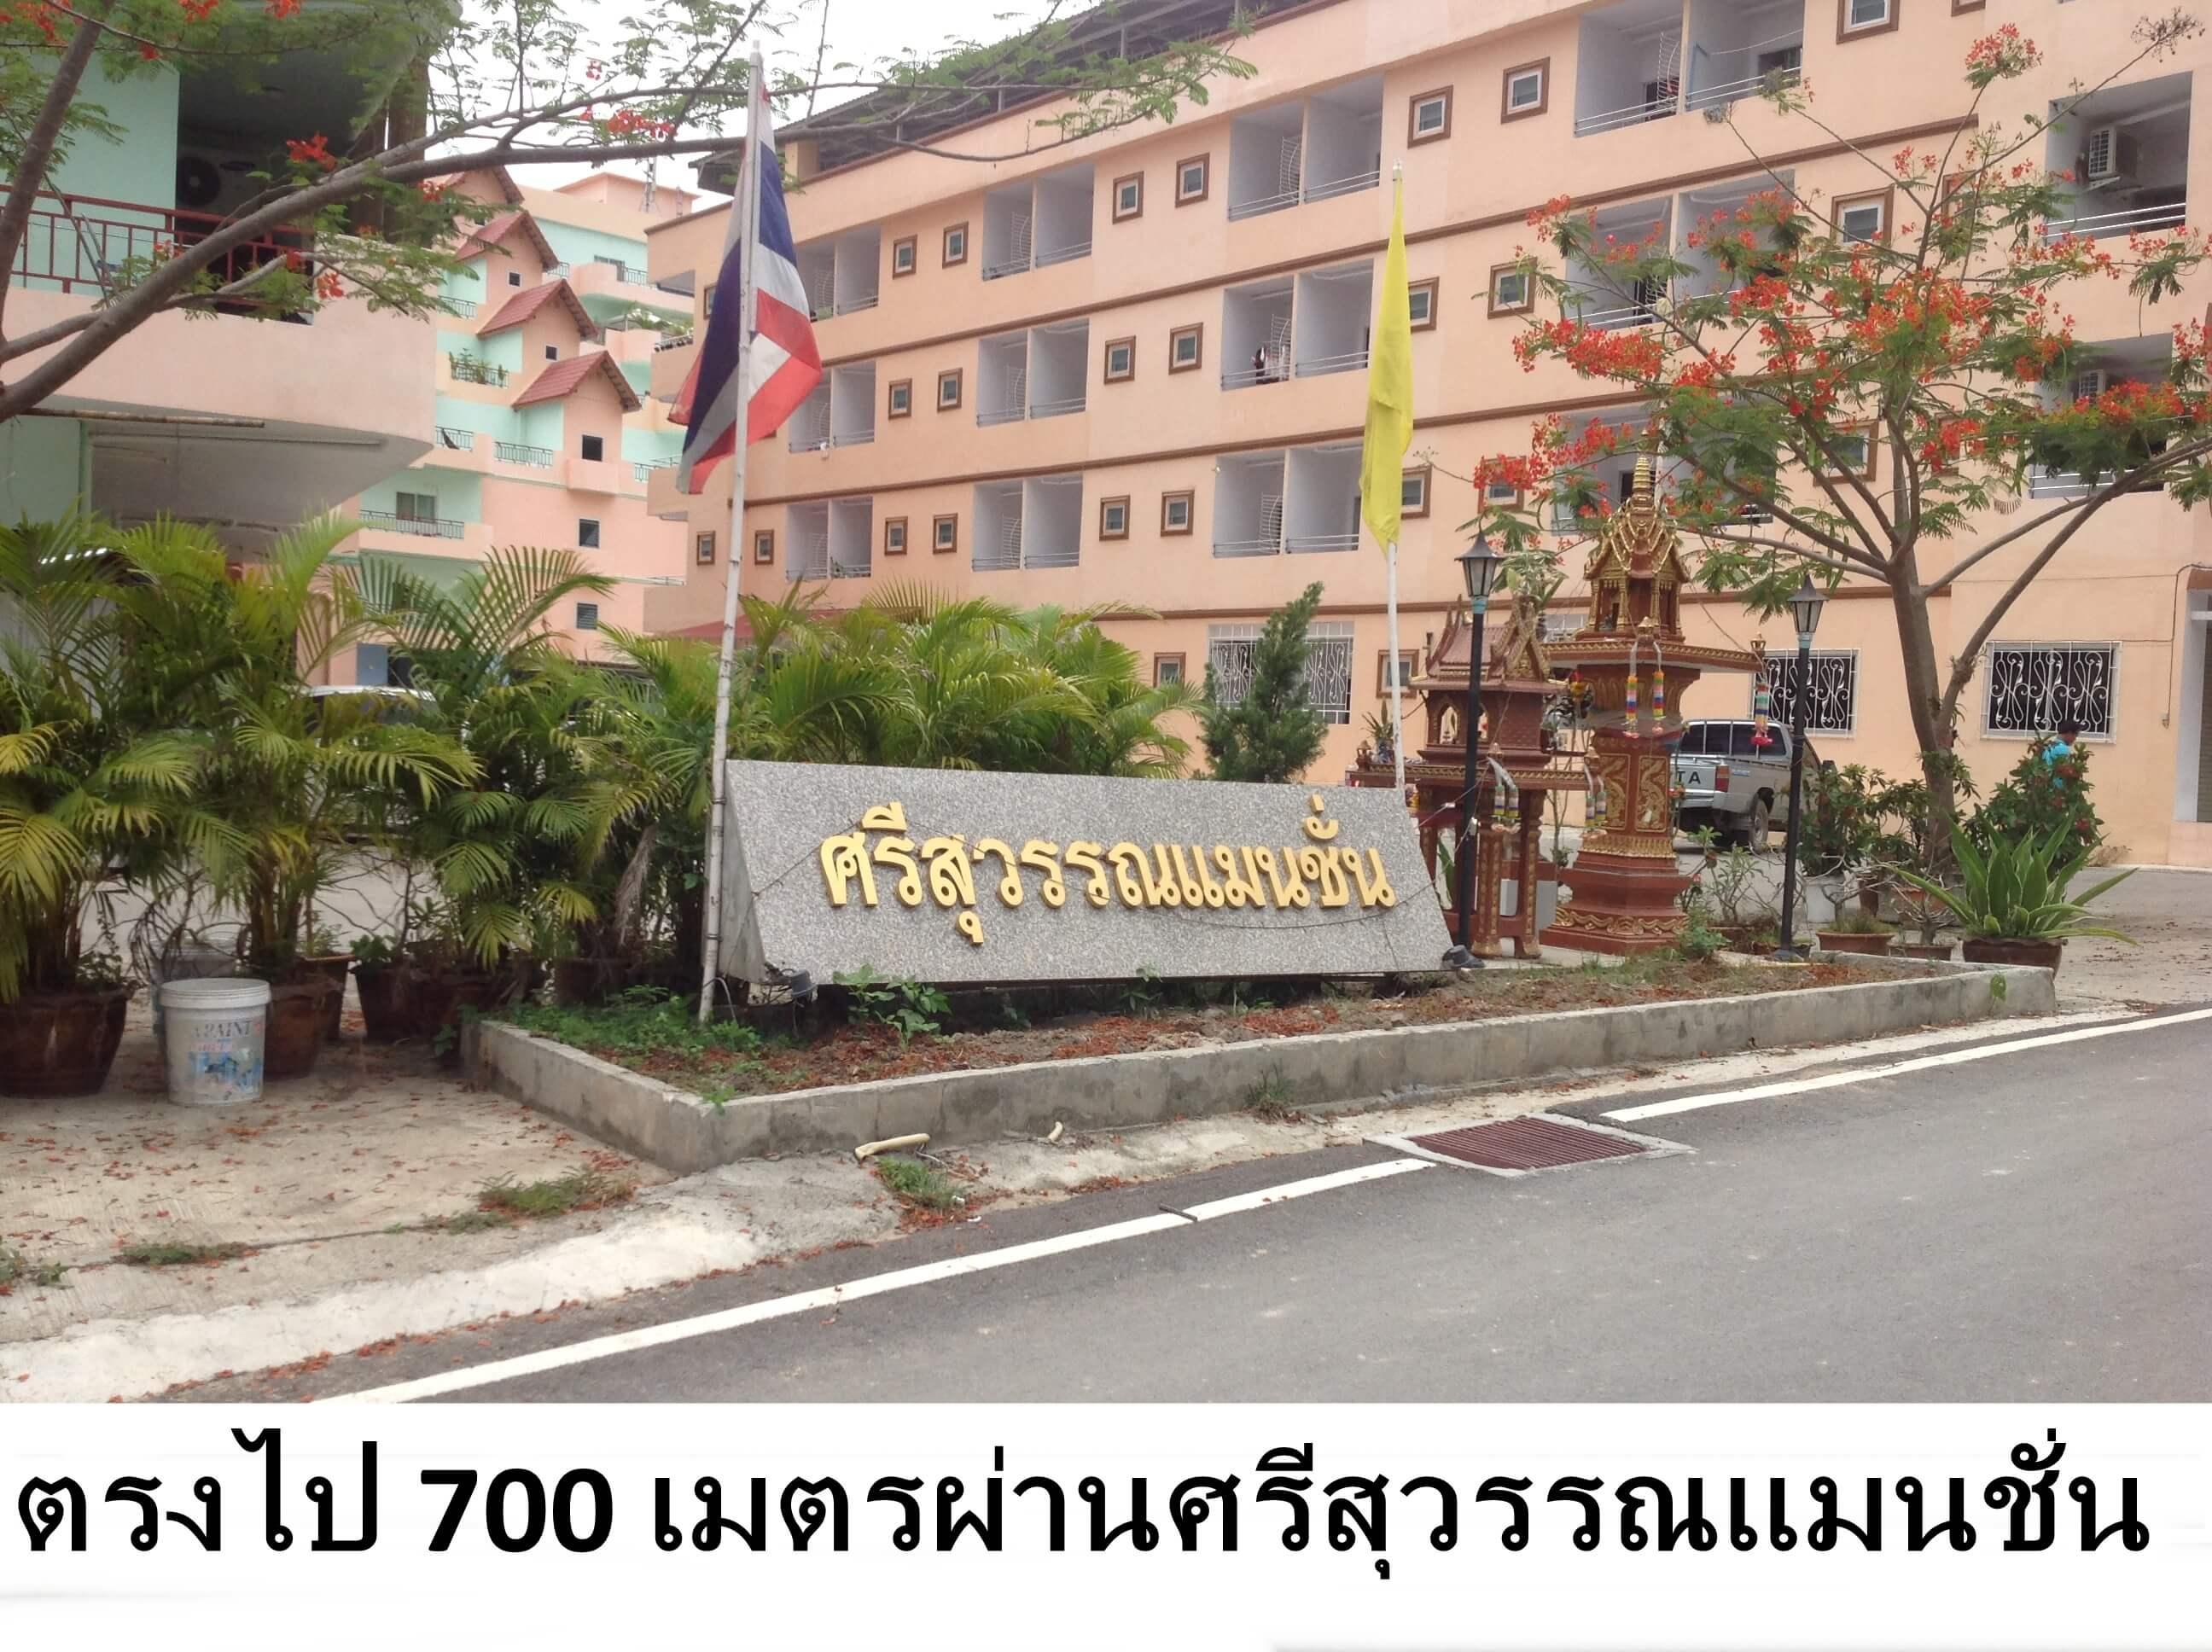 5 Chiang Mai Swimming Pool